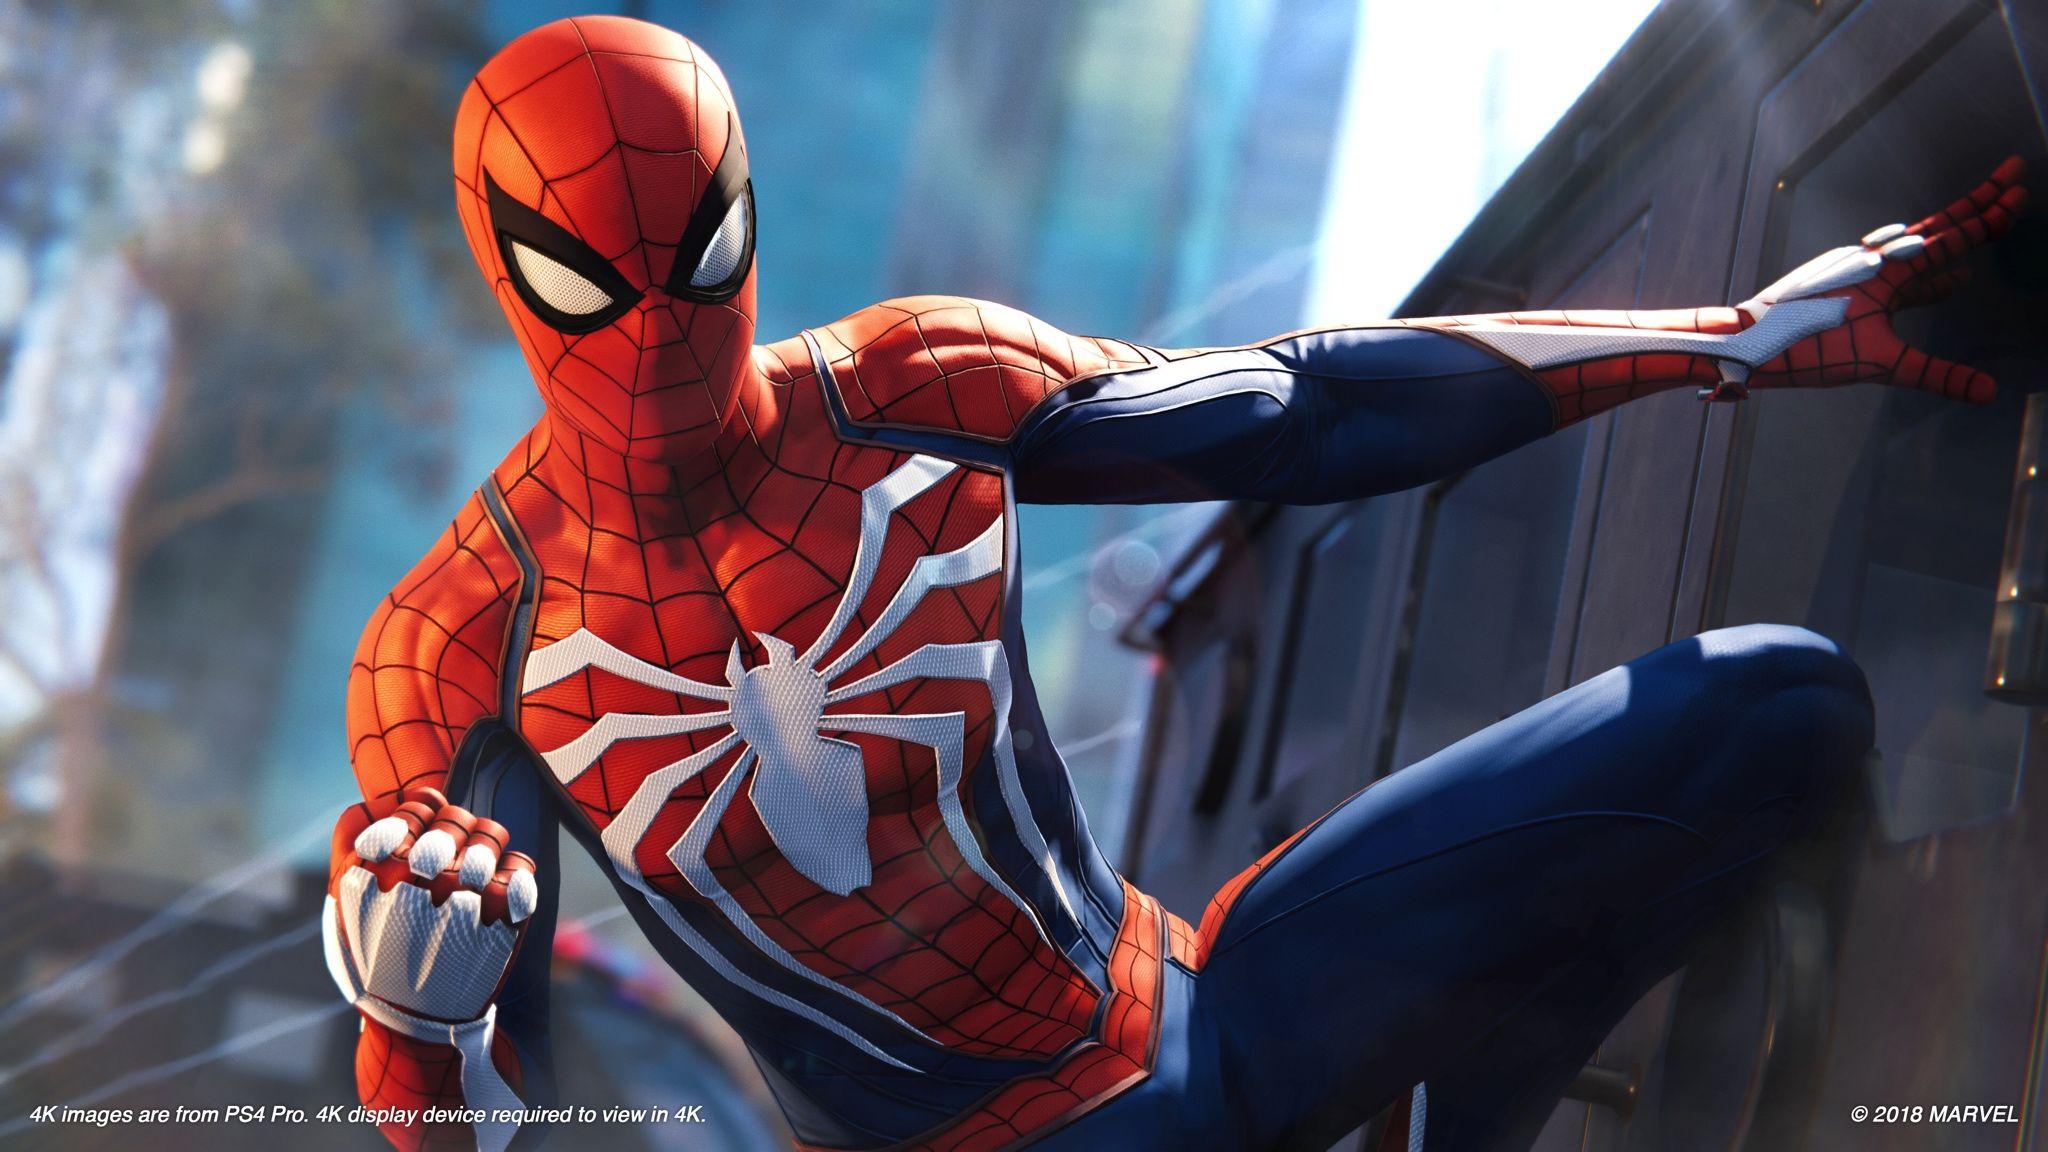 Spider Man Ps4 Hd Wallpaper Spiderman Spiderman Ps4 Spider Man Ps4